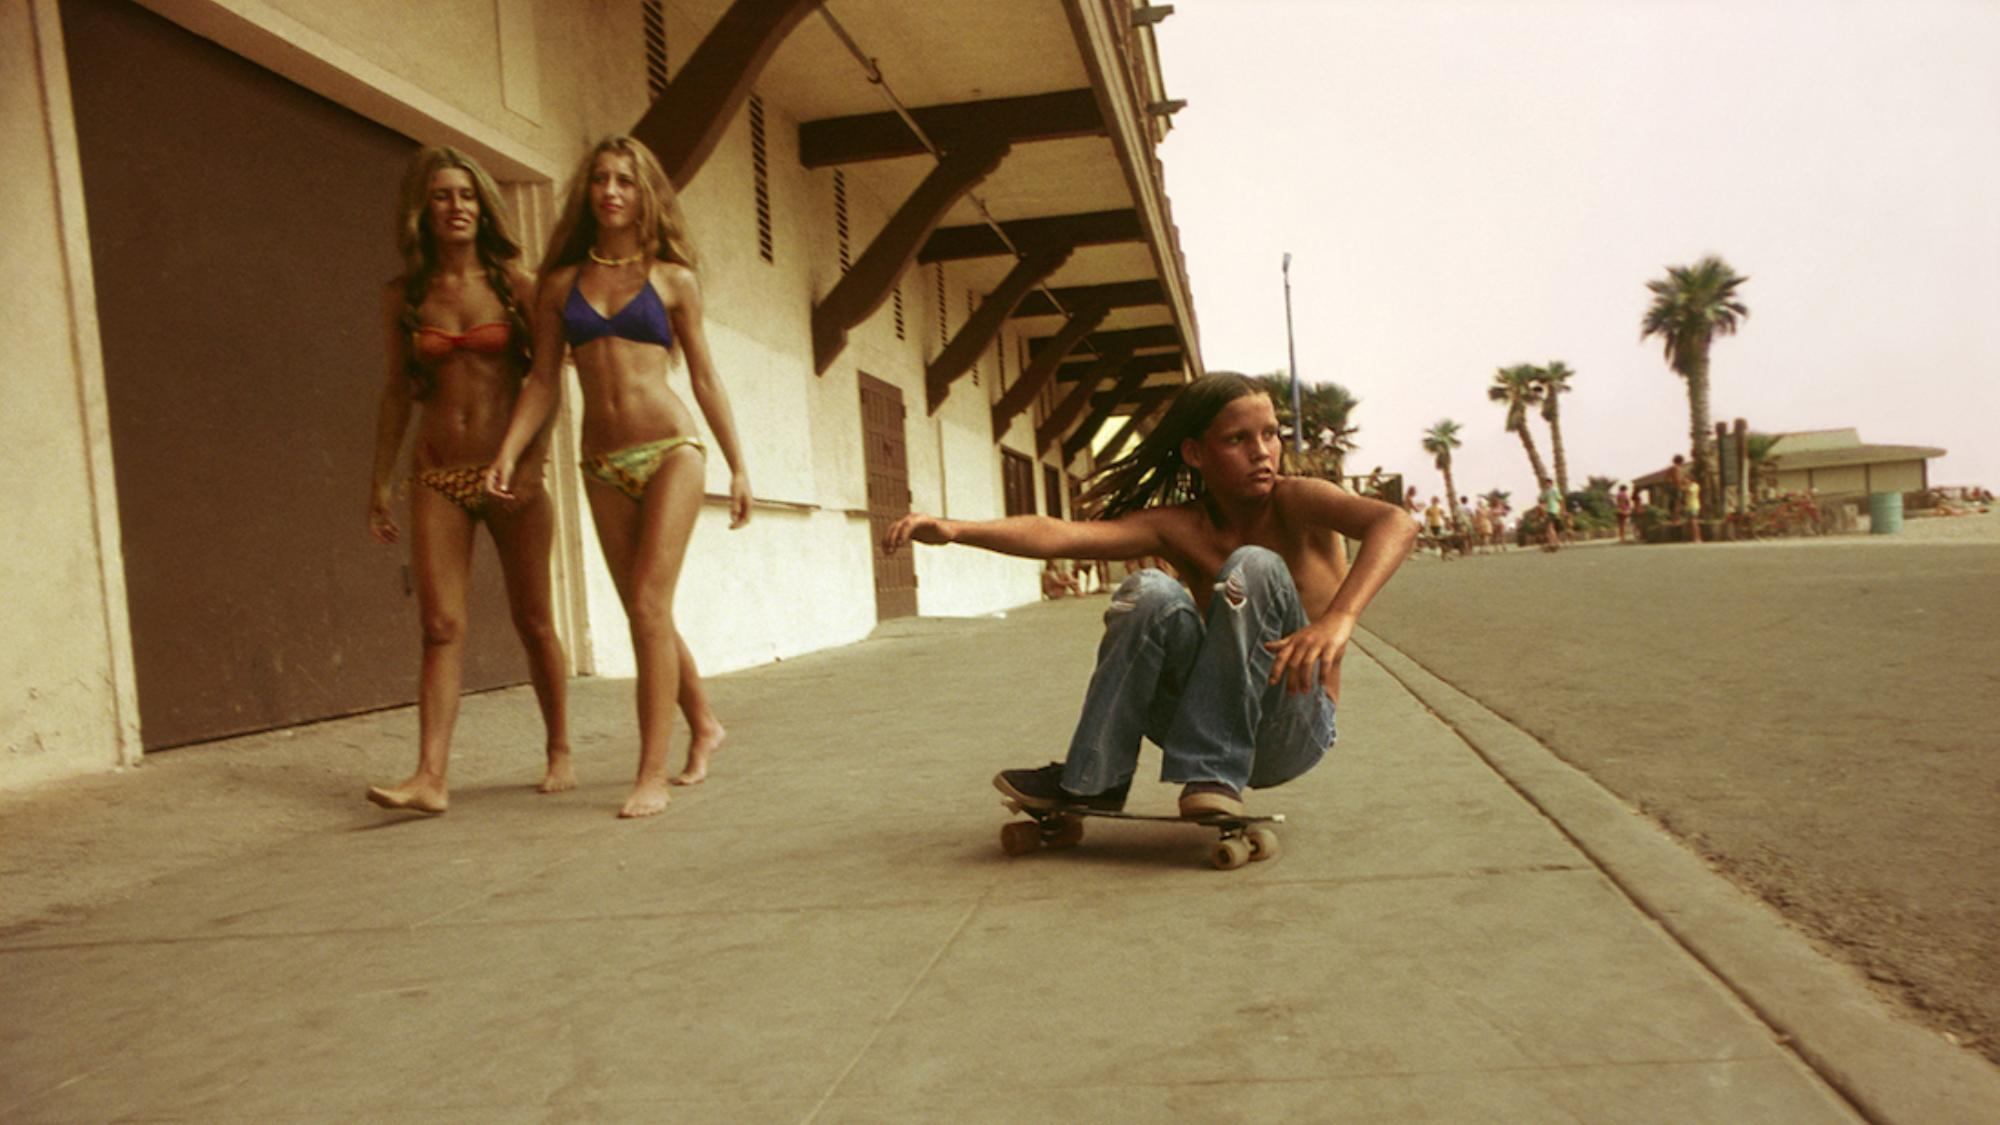 rediscovered-photos-of-the-70s-hollywood-skate-scene-1439398811.jpg